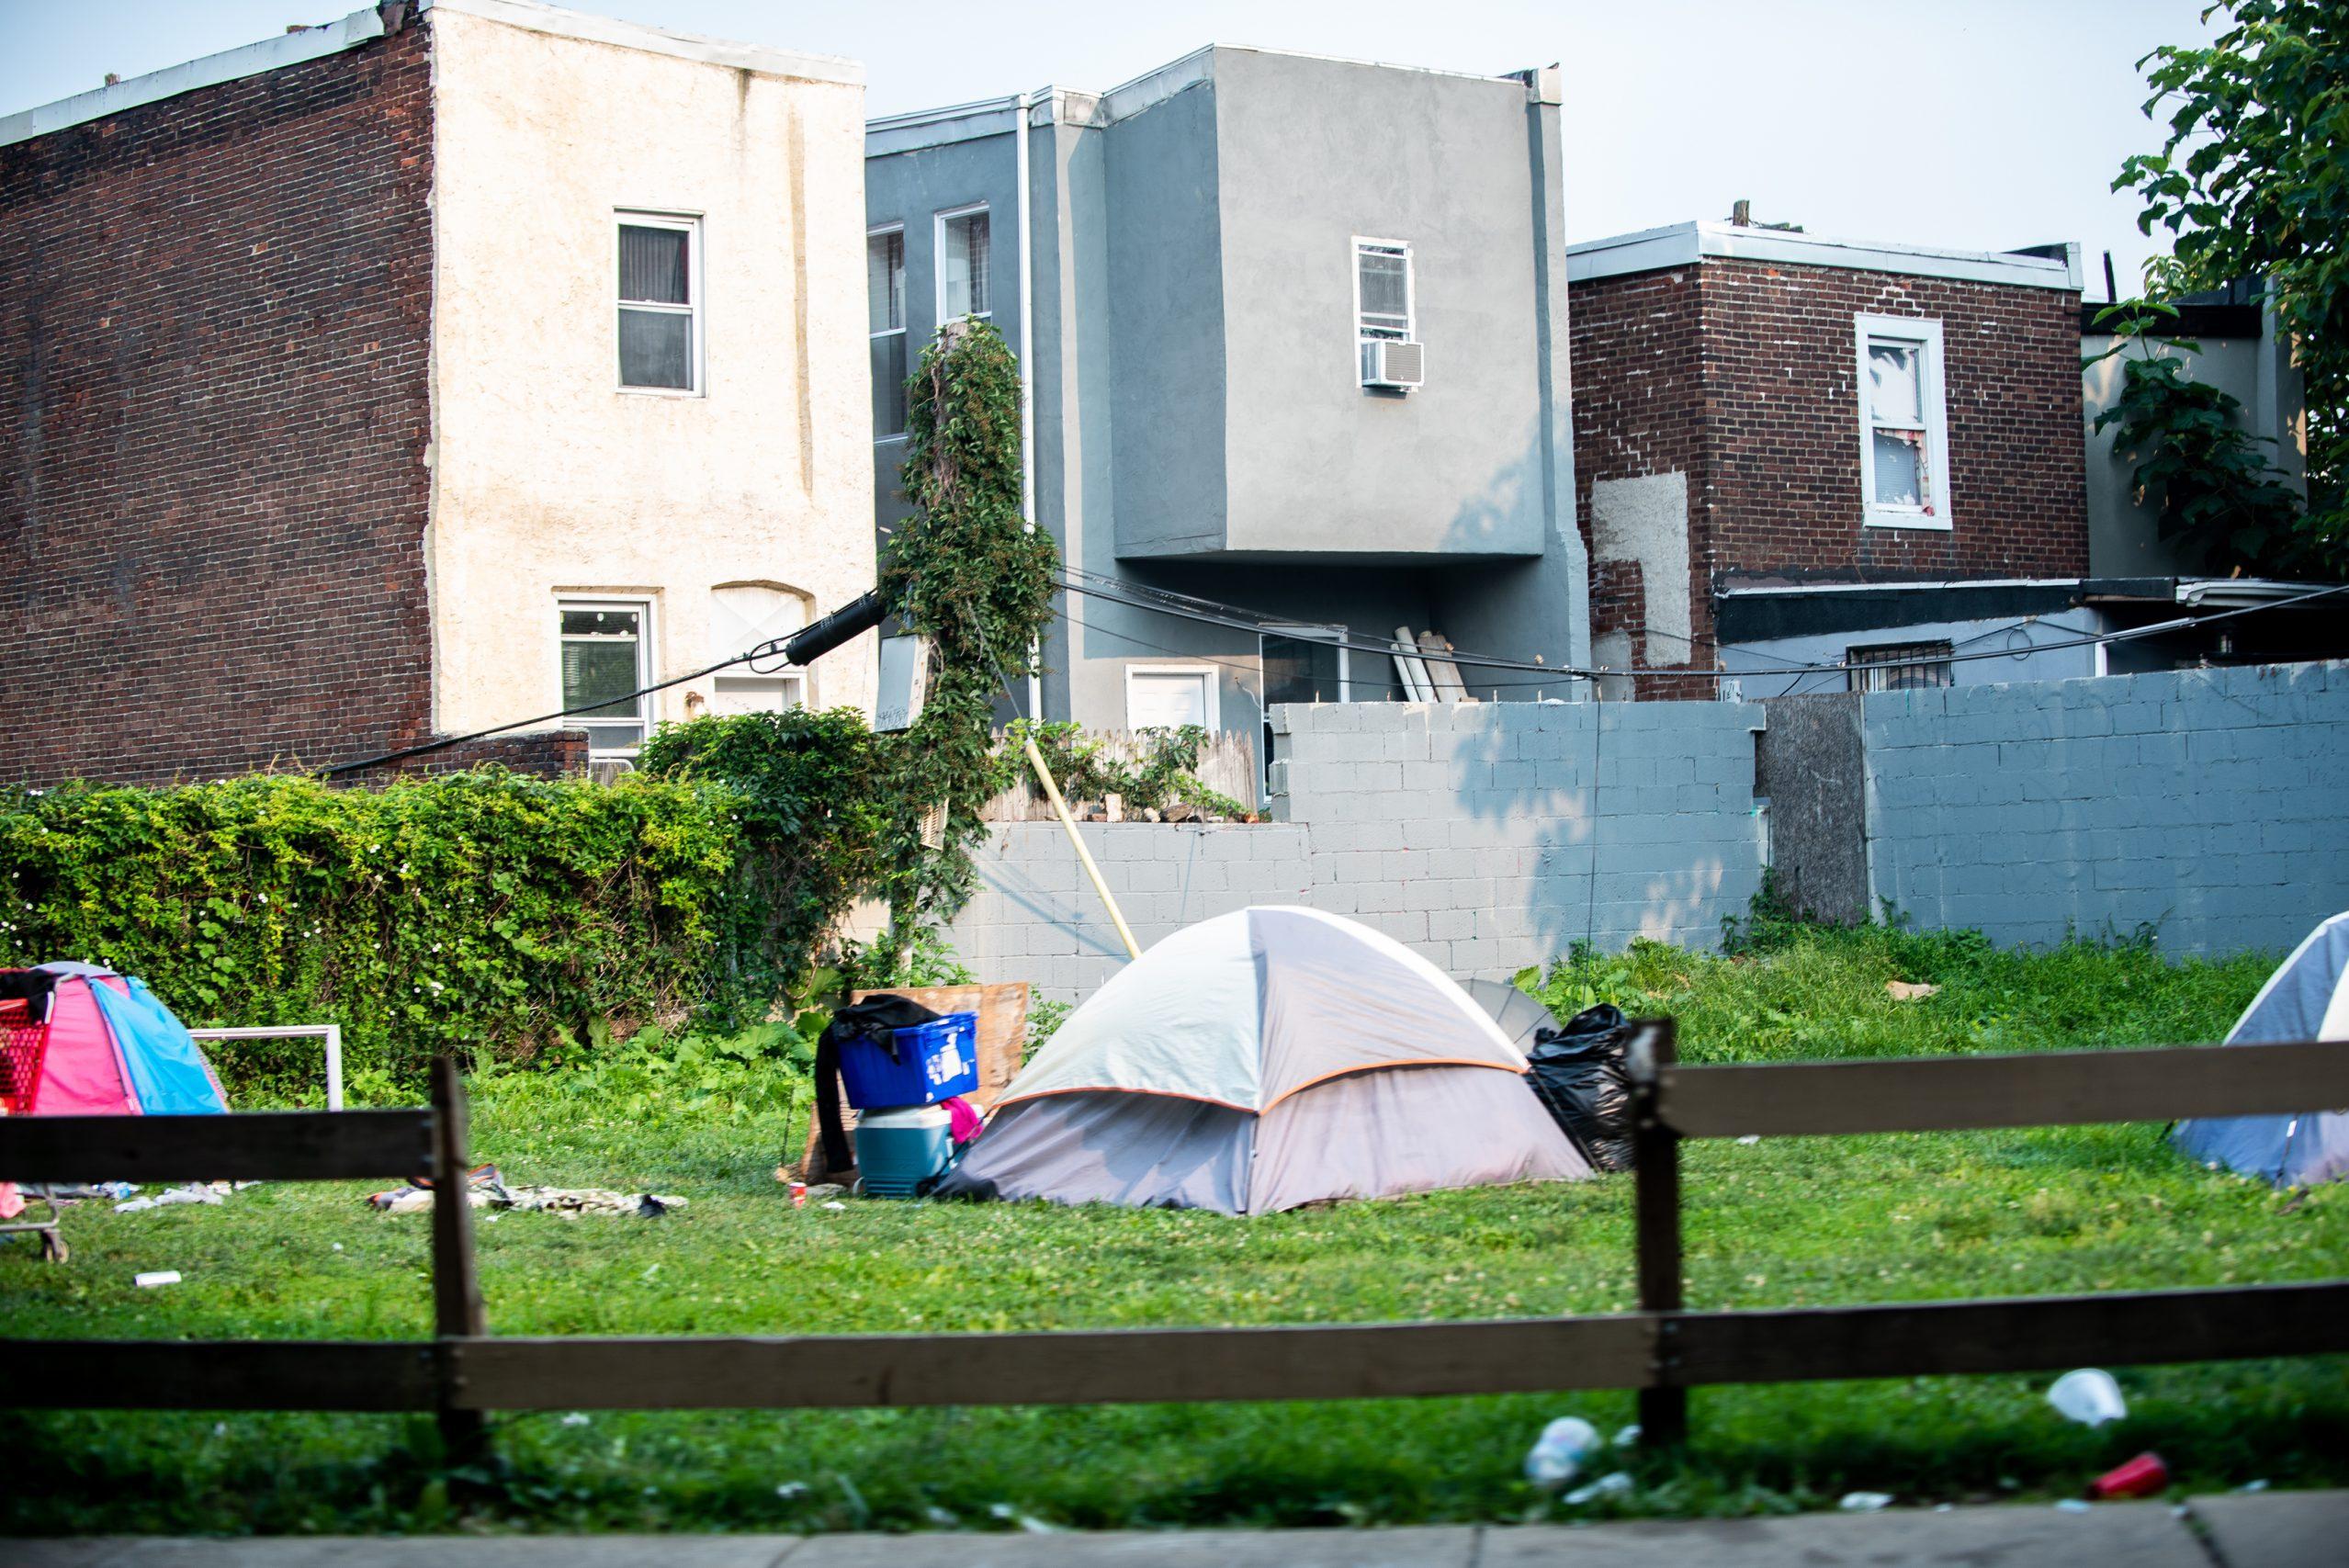 kensington encampments